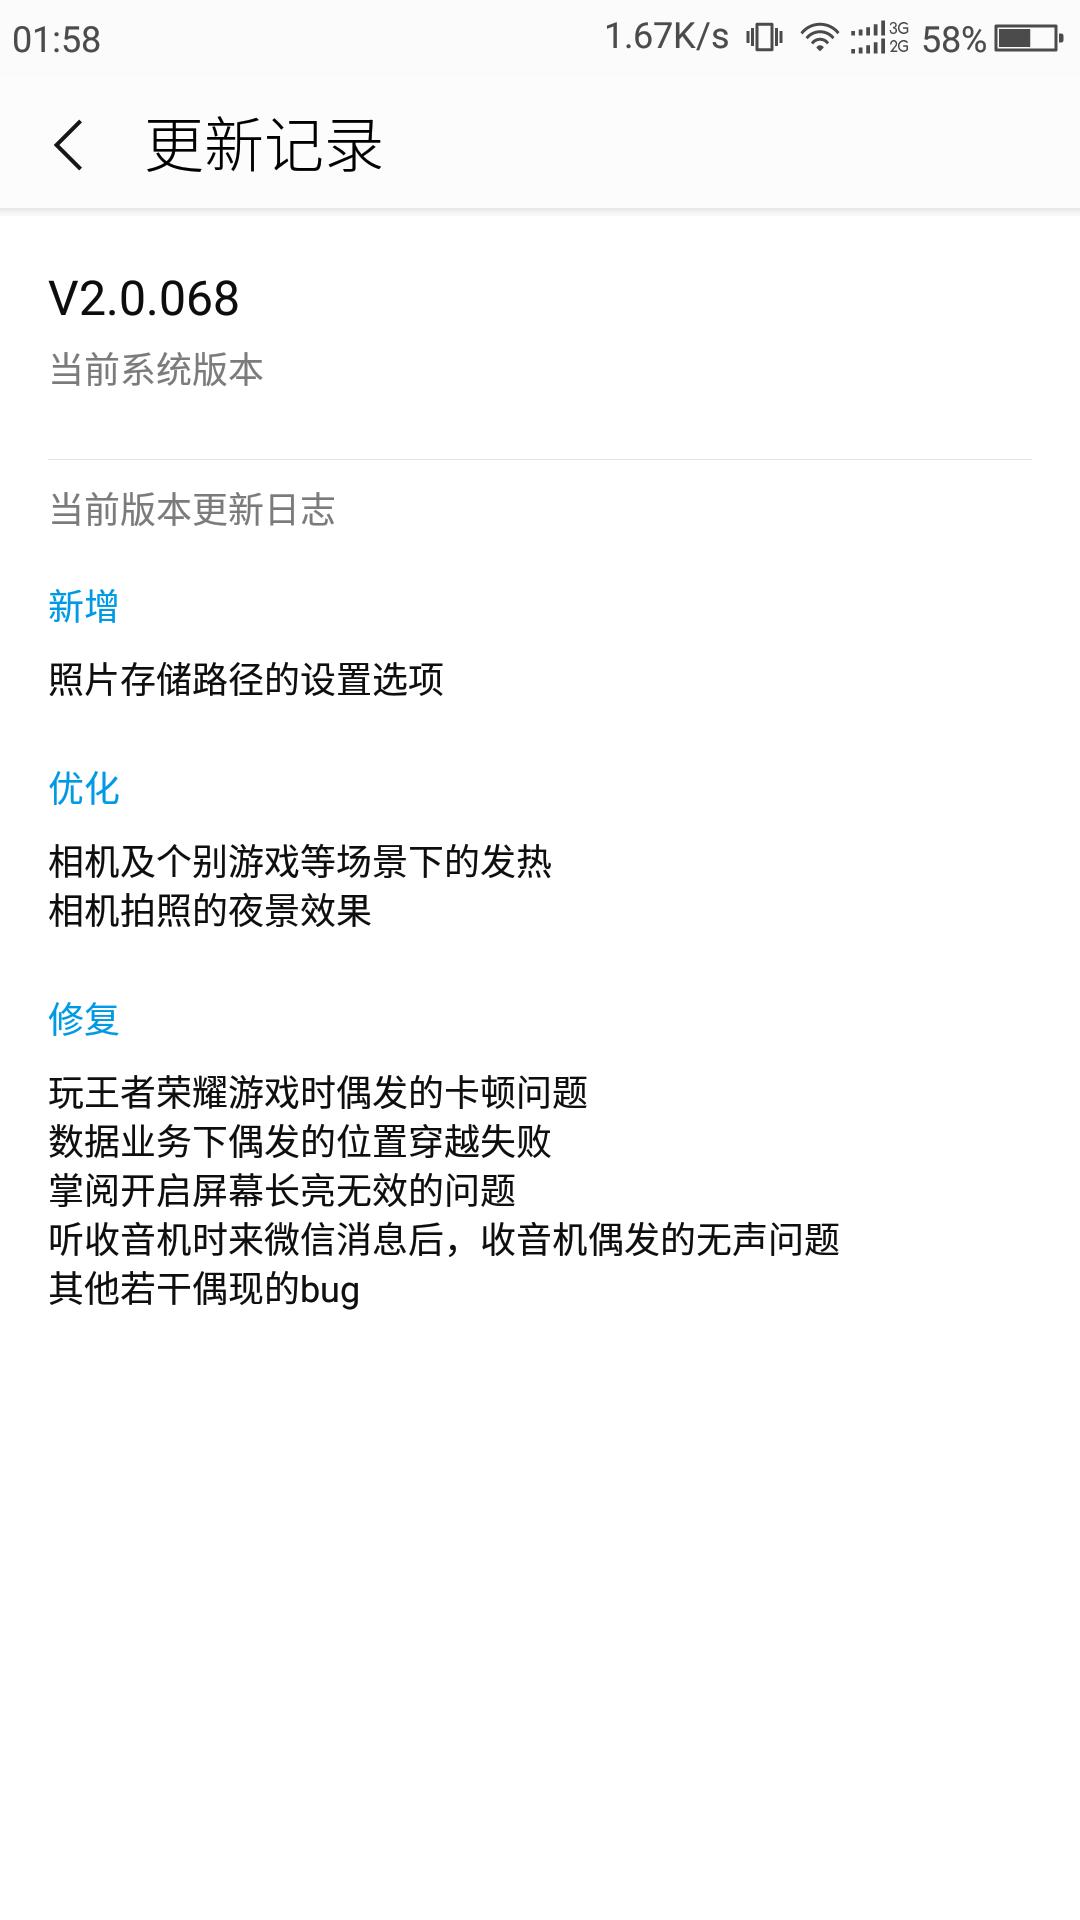 Screenshot_2016-08-19-01-58-37.png